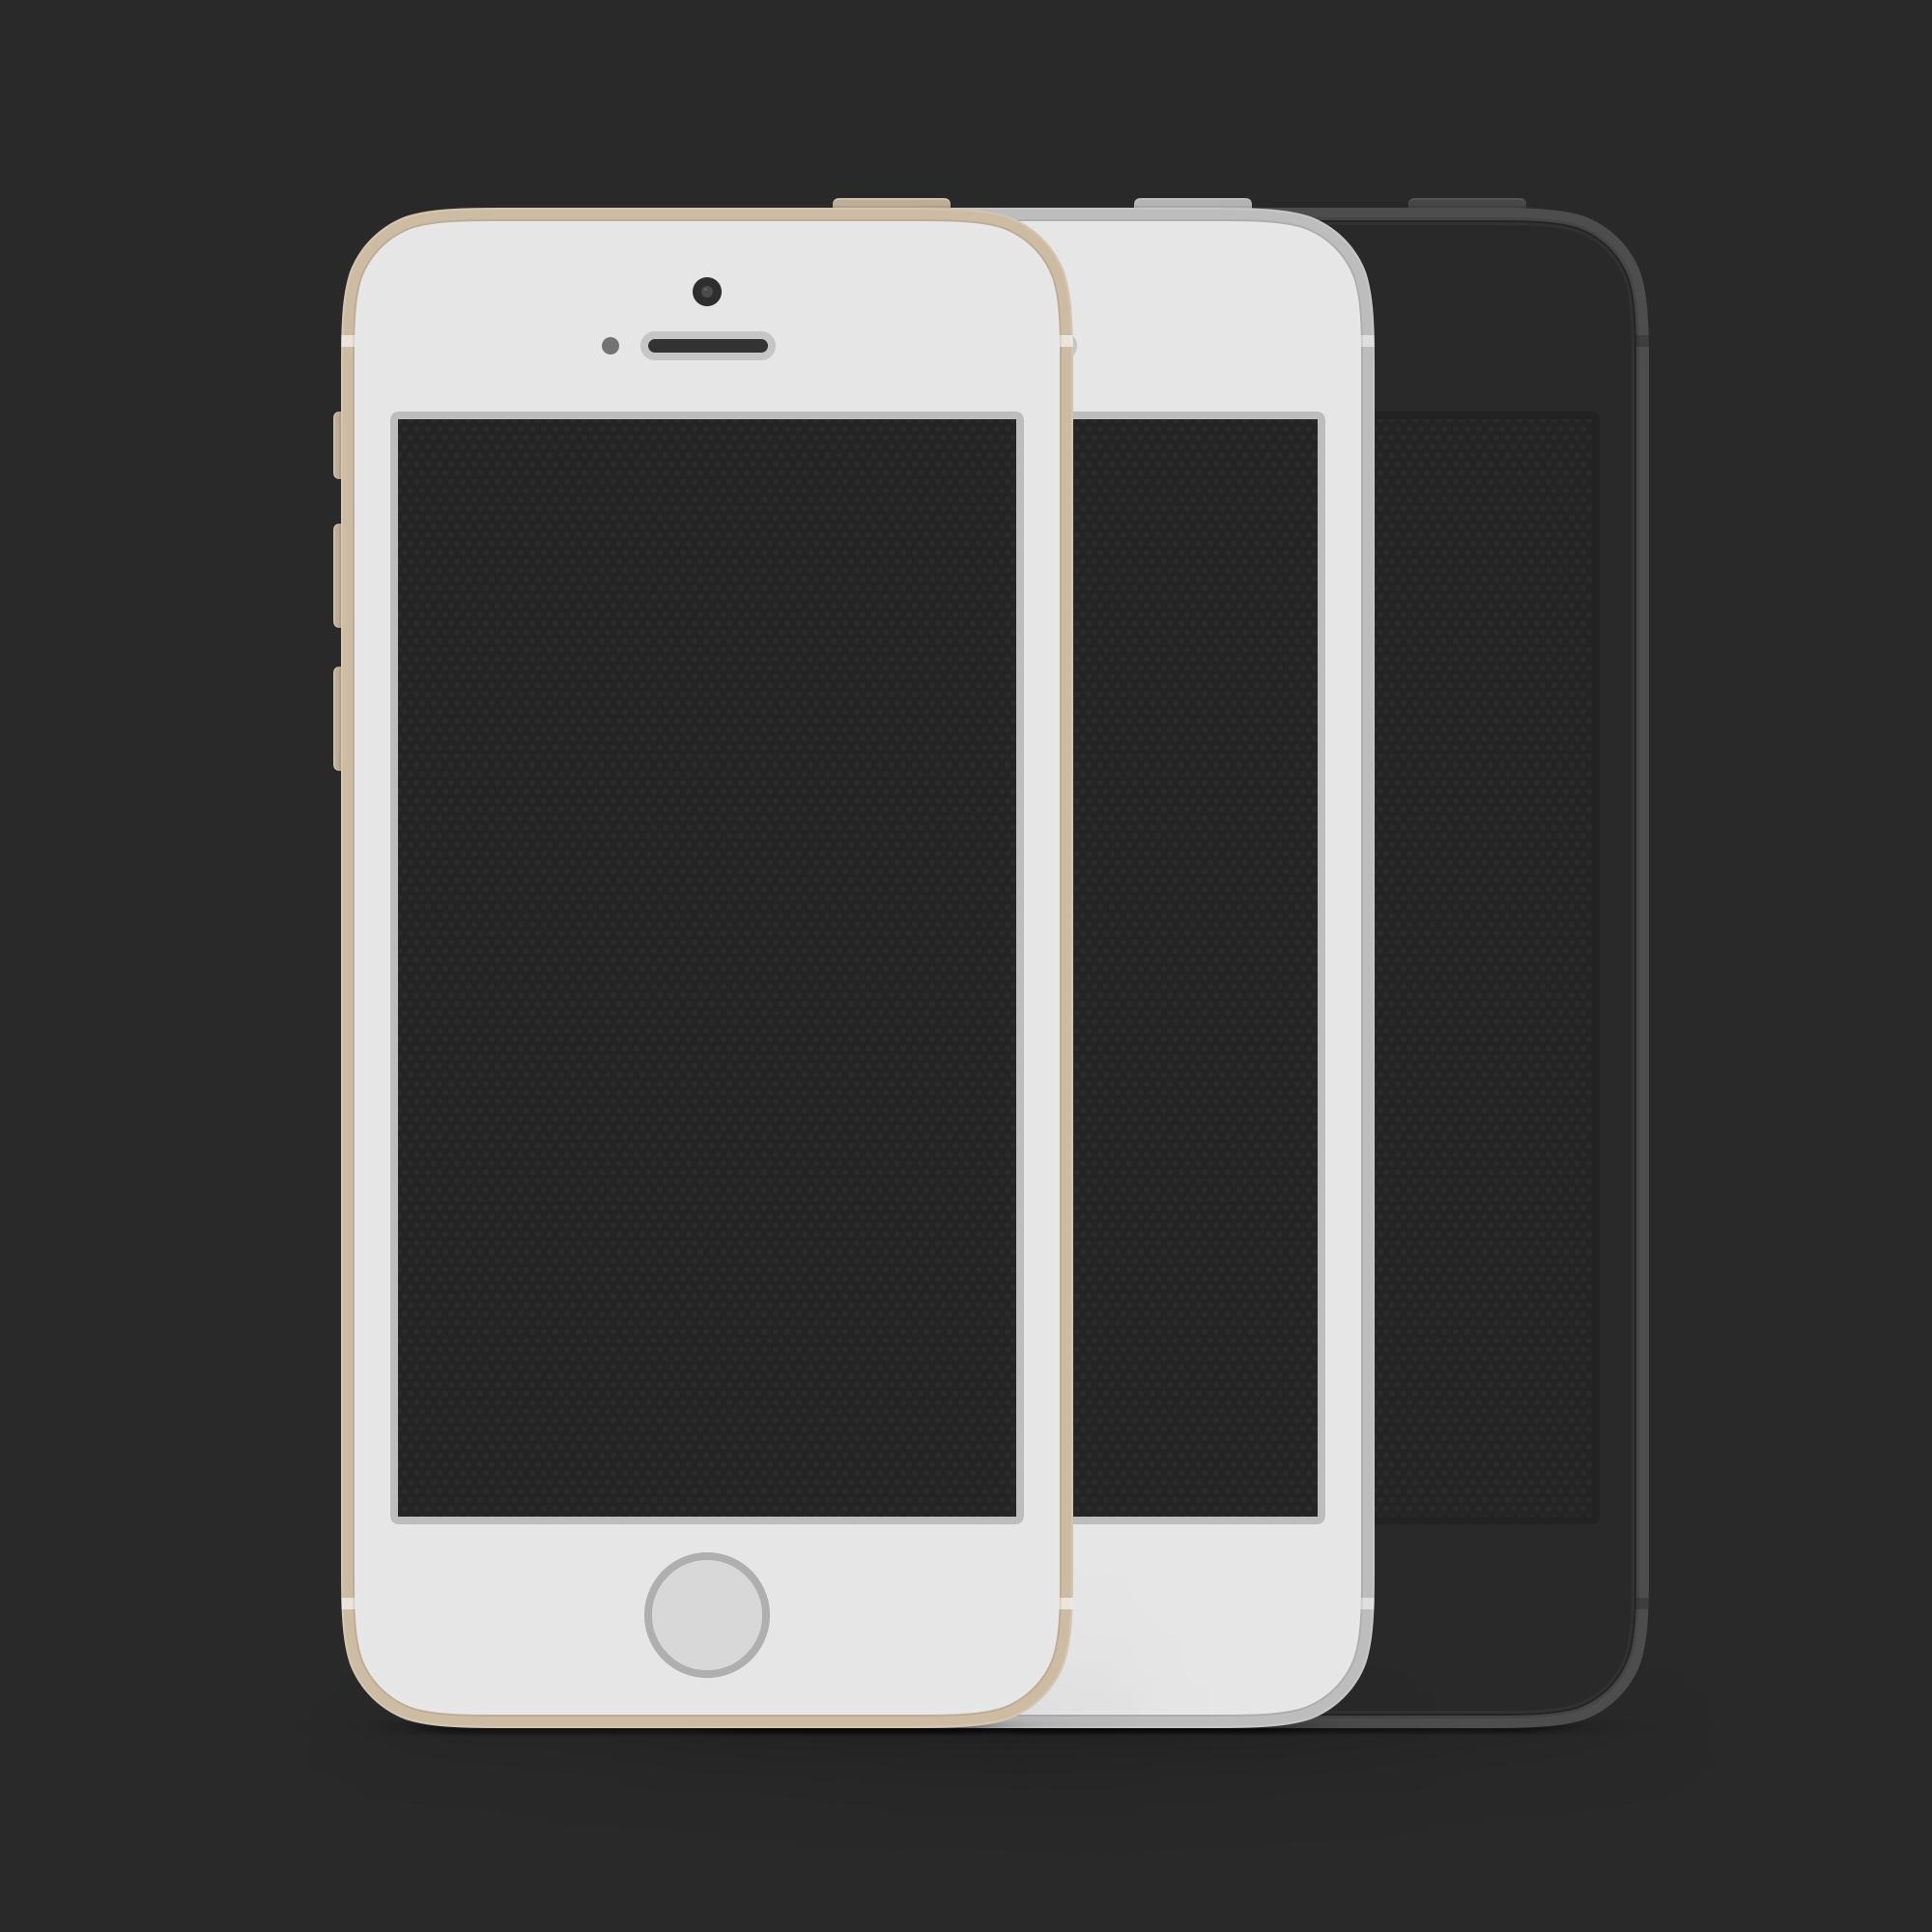 Free Flat iPhone 5S Mockups PSD - TitanUI